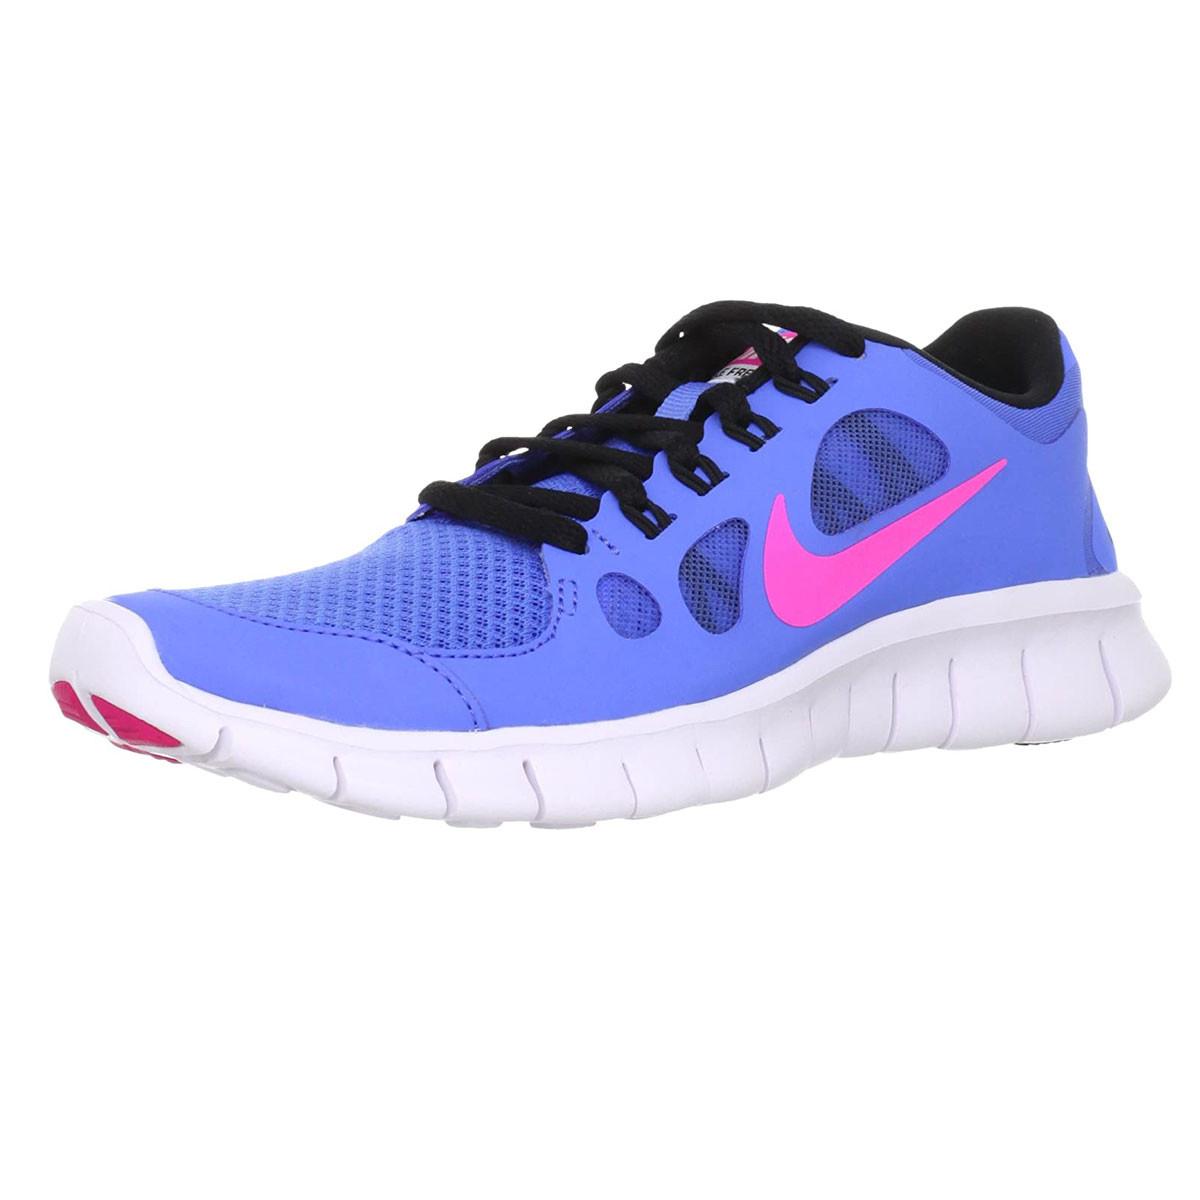 lava localizar Giro de vuelta  Zapatillas Nike Free 5.0 Gg 2013 J Running para Junior | Runa Store